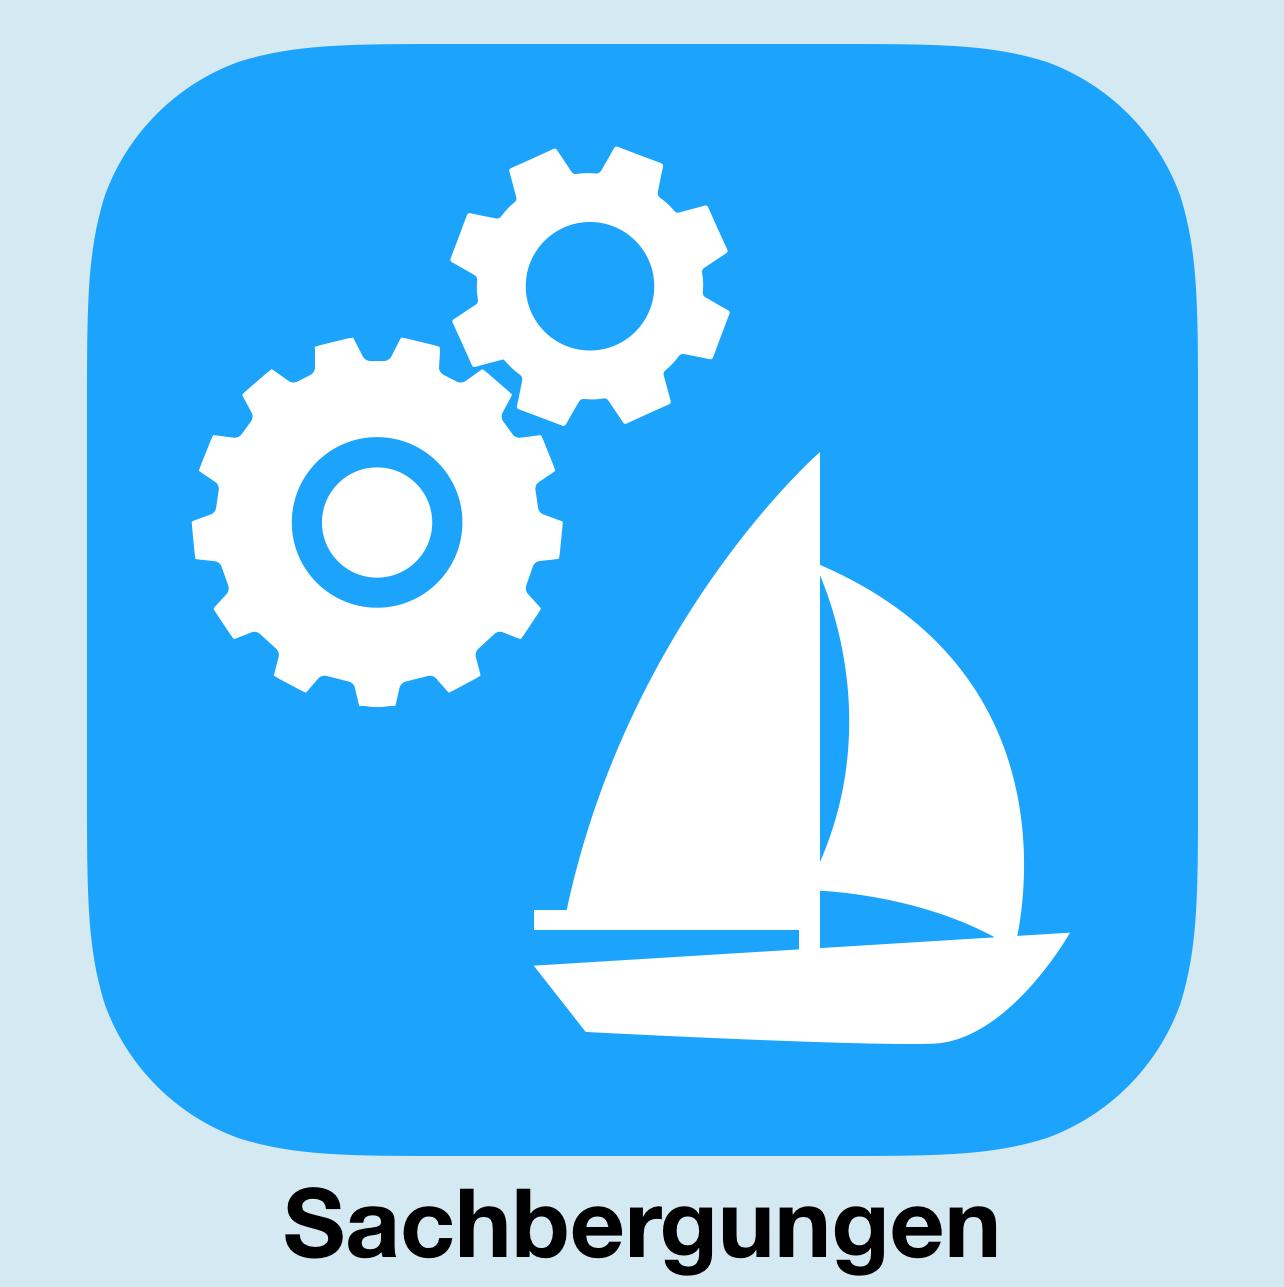 Sachbergungen